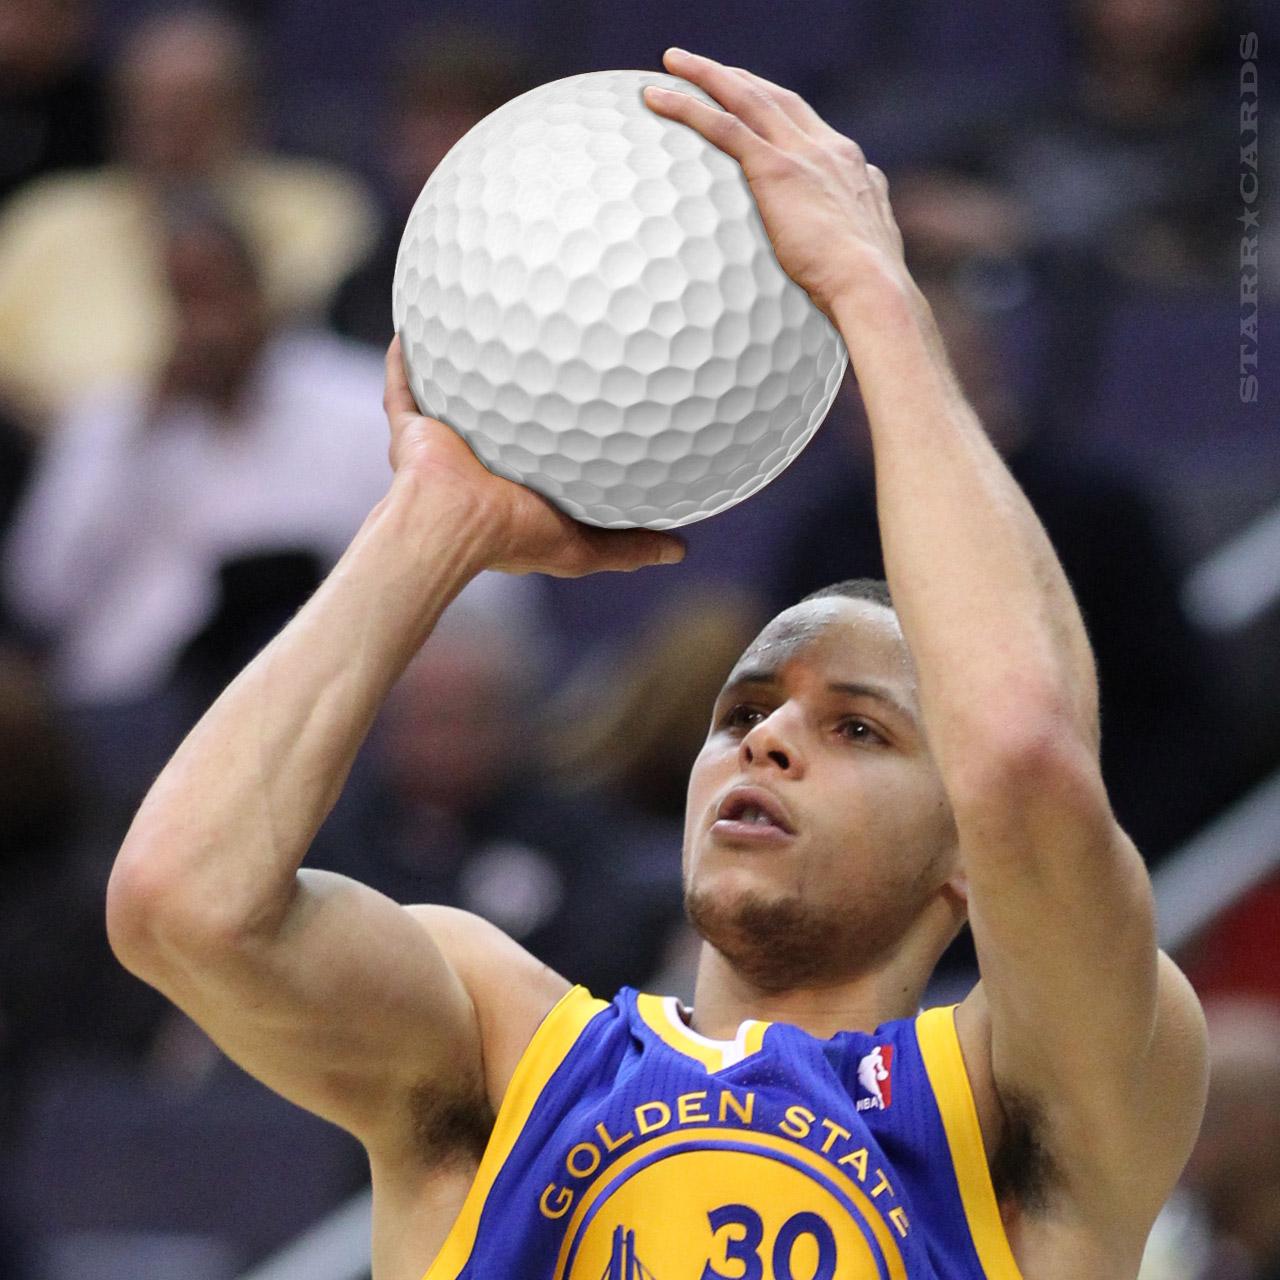 Steph Curry shoots a golf ball